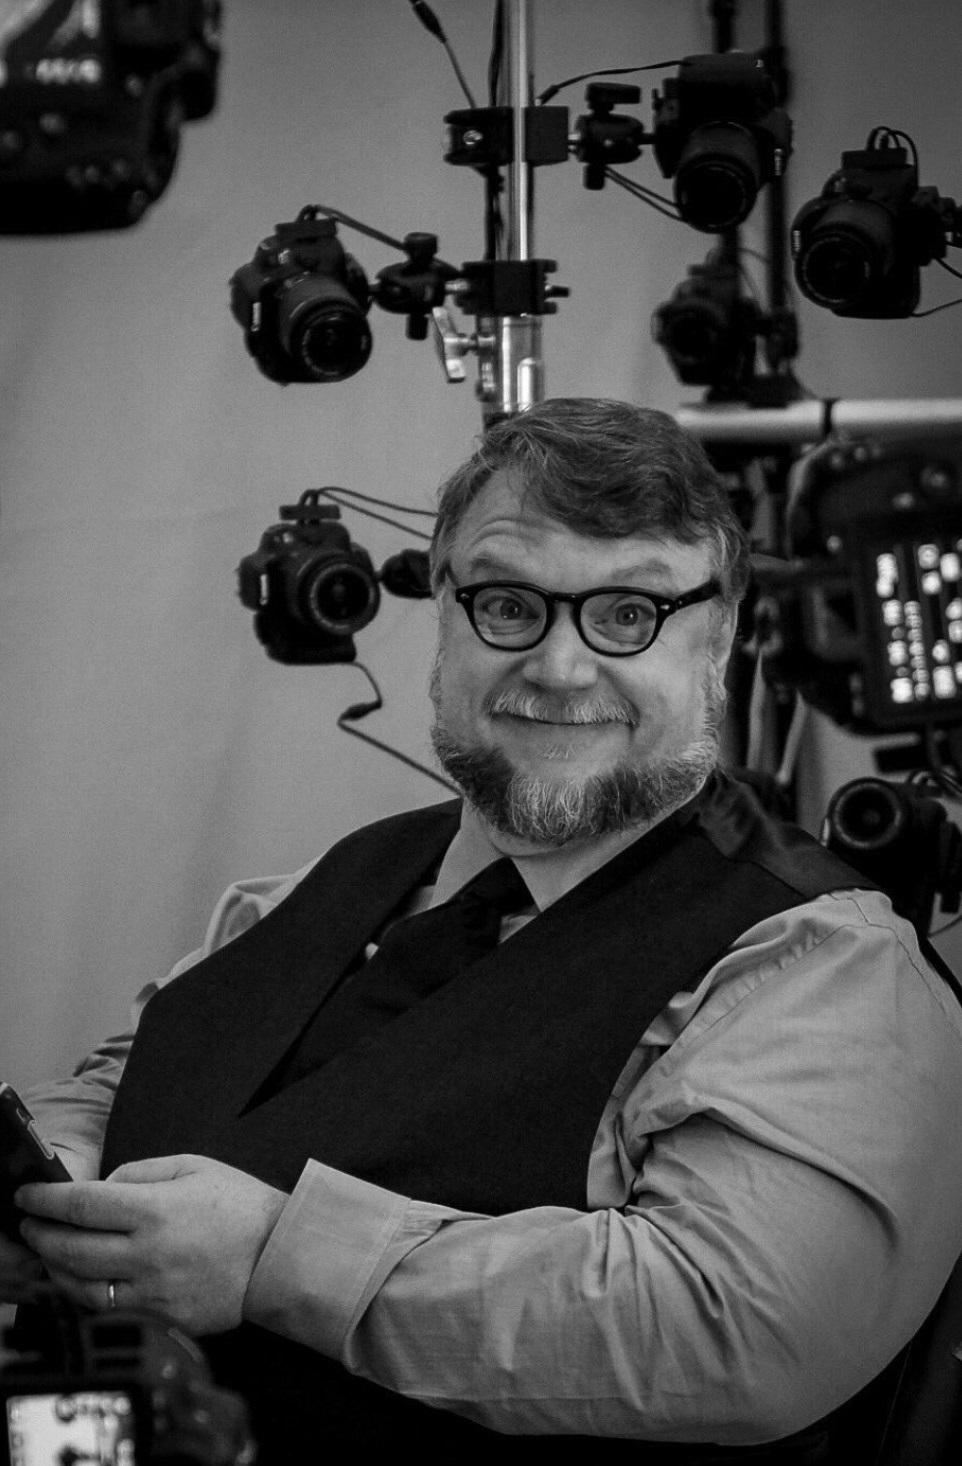 Death Stranding; screenshot: Guillermo del Toro motion capture